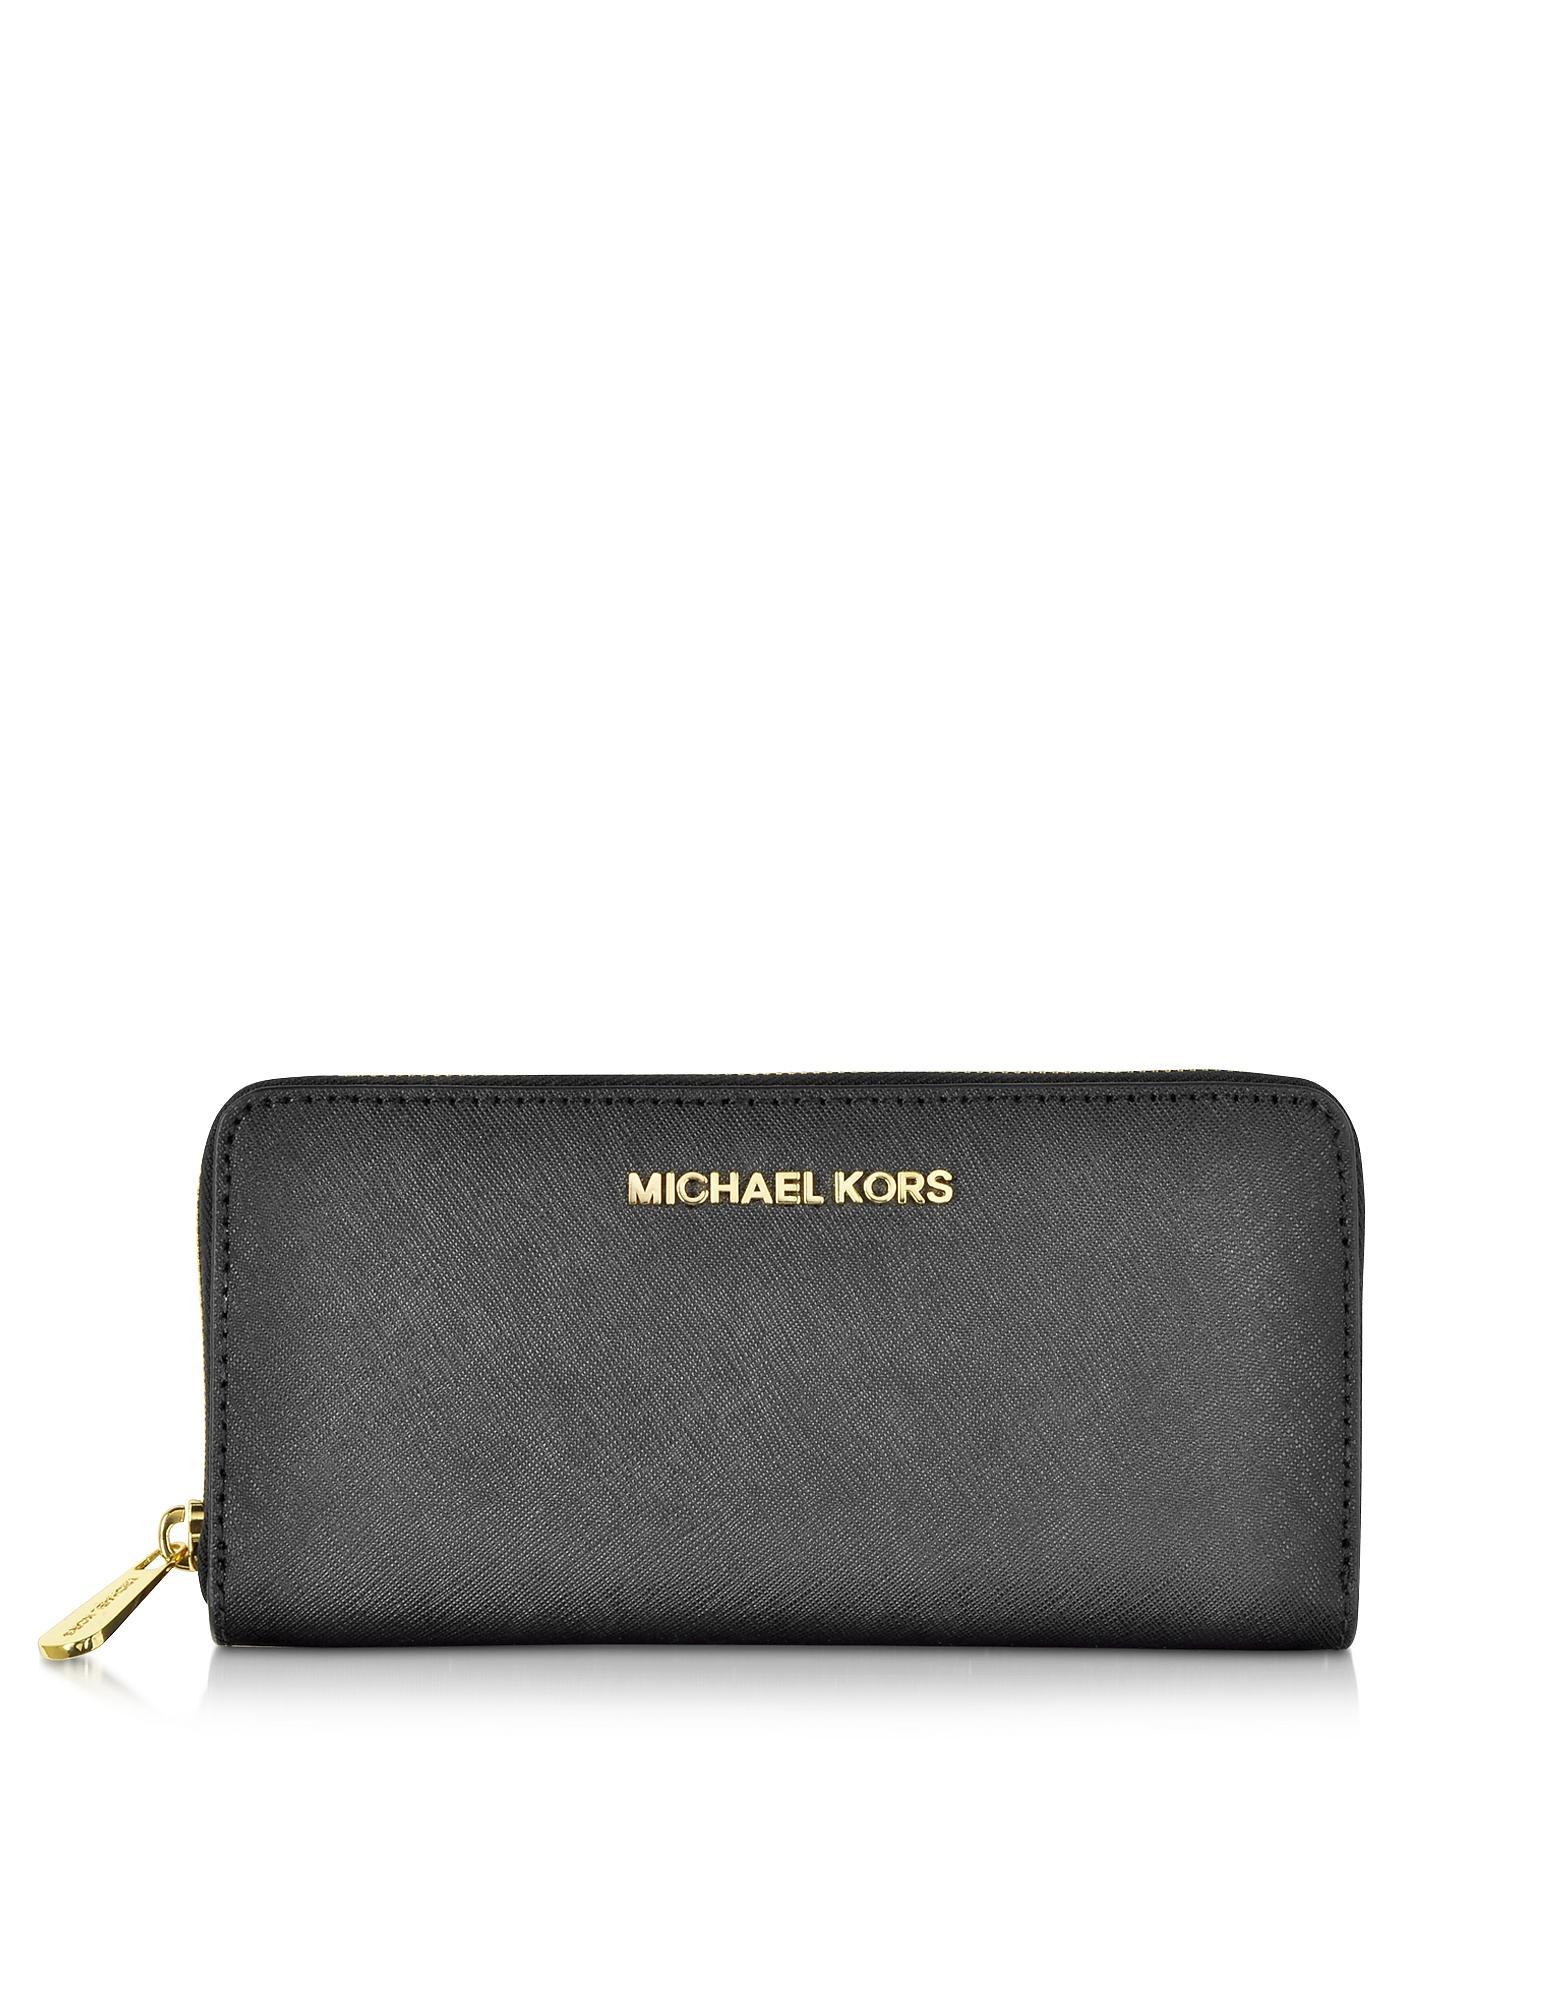 7548f8c5ed22db Michael Kors Saffiano Wallet Uk. Michael kors Black Jet Set Travel Saffiano  Leather Continental Wallet in Black | Lyst